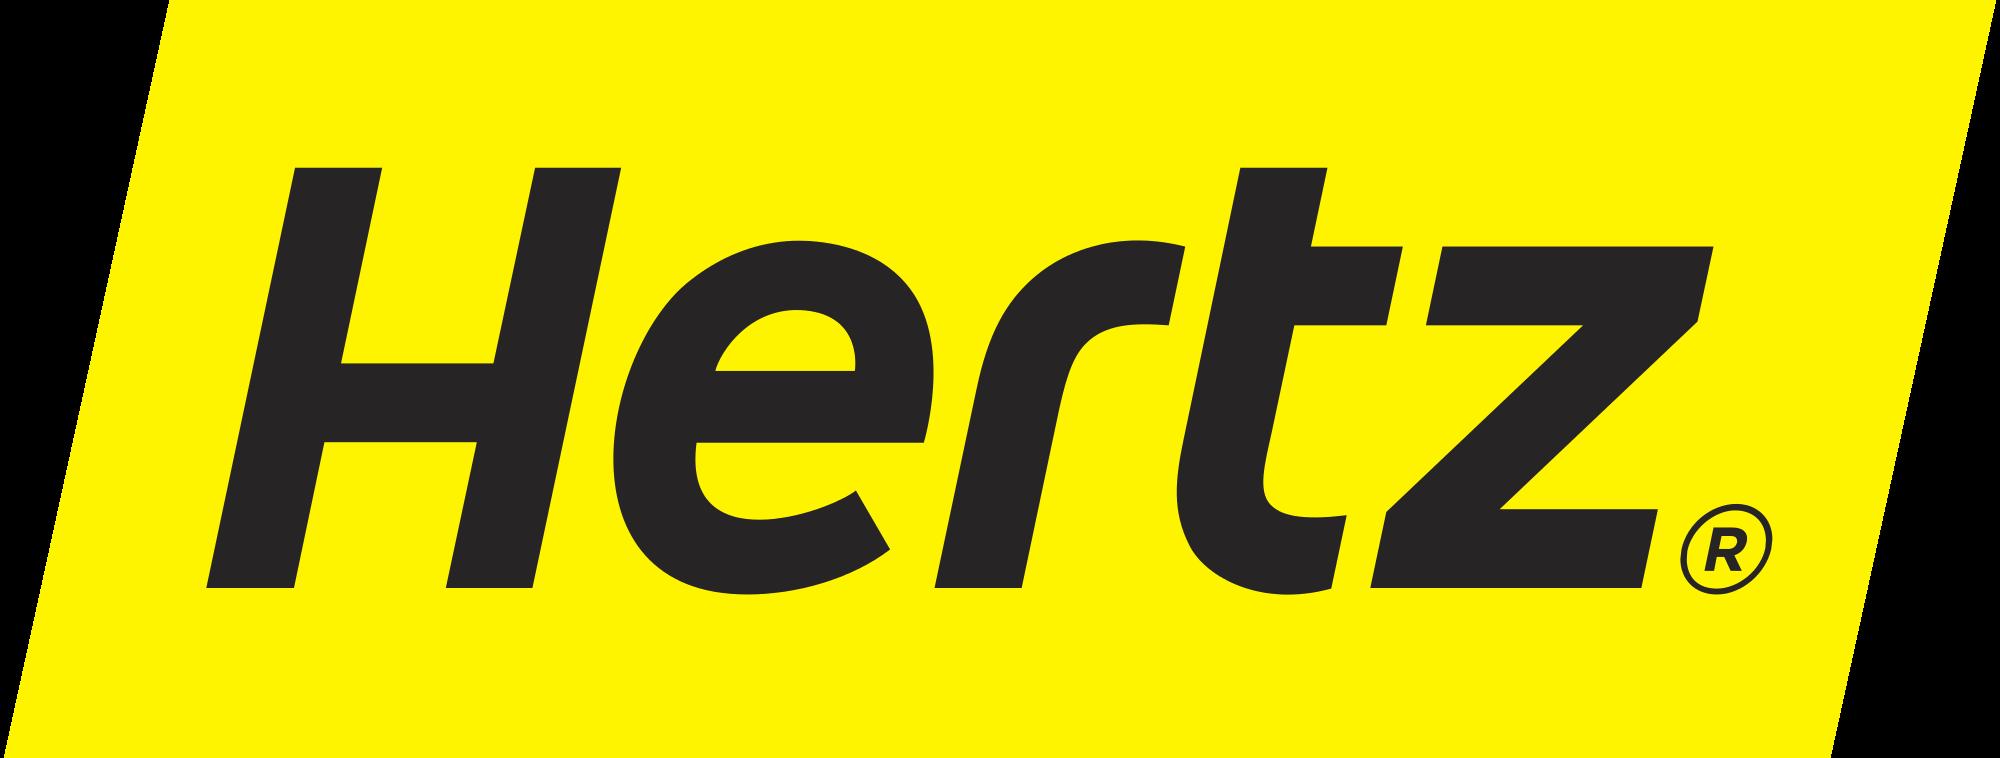 Hertz_Logo.png